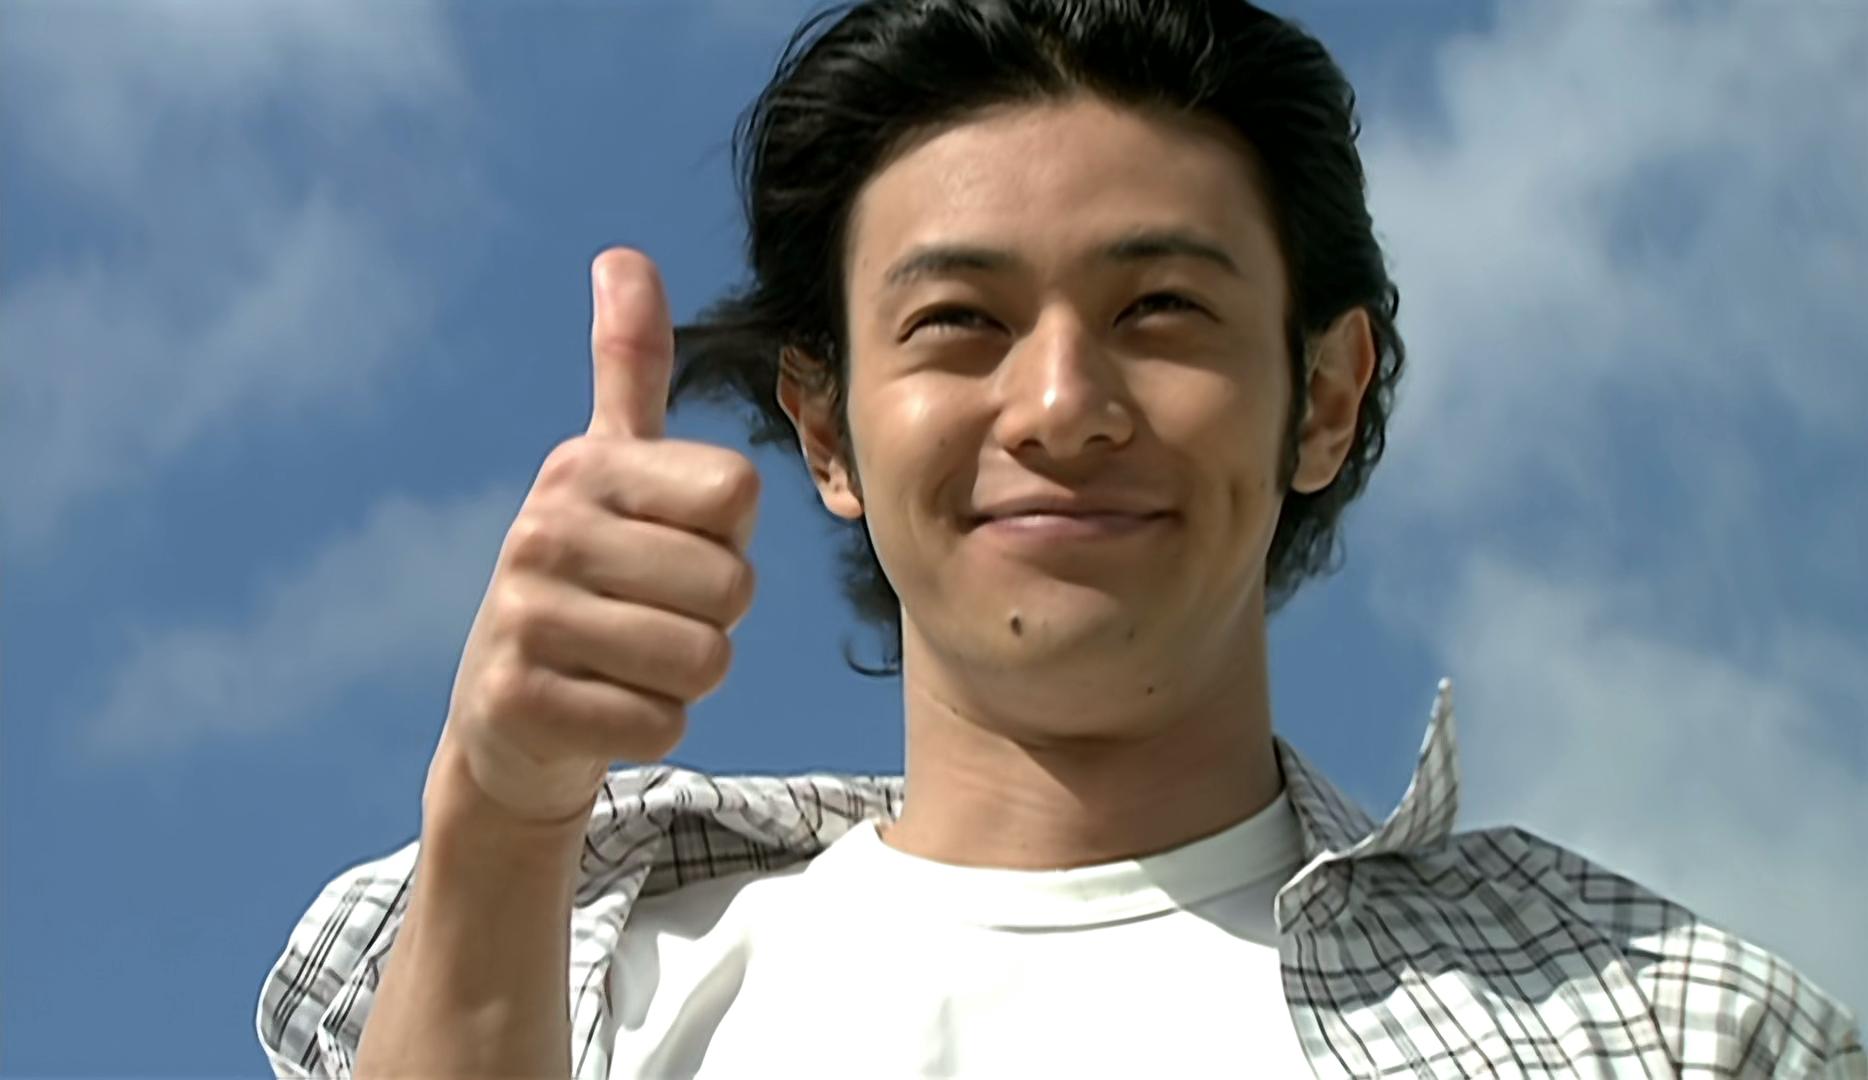 Yusuke Godai | Kamen Rider Wiki | Fandom